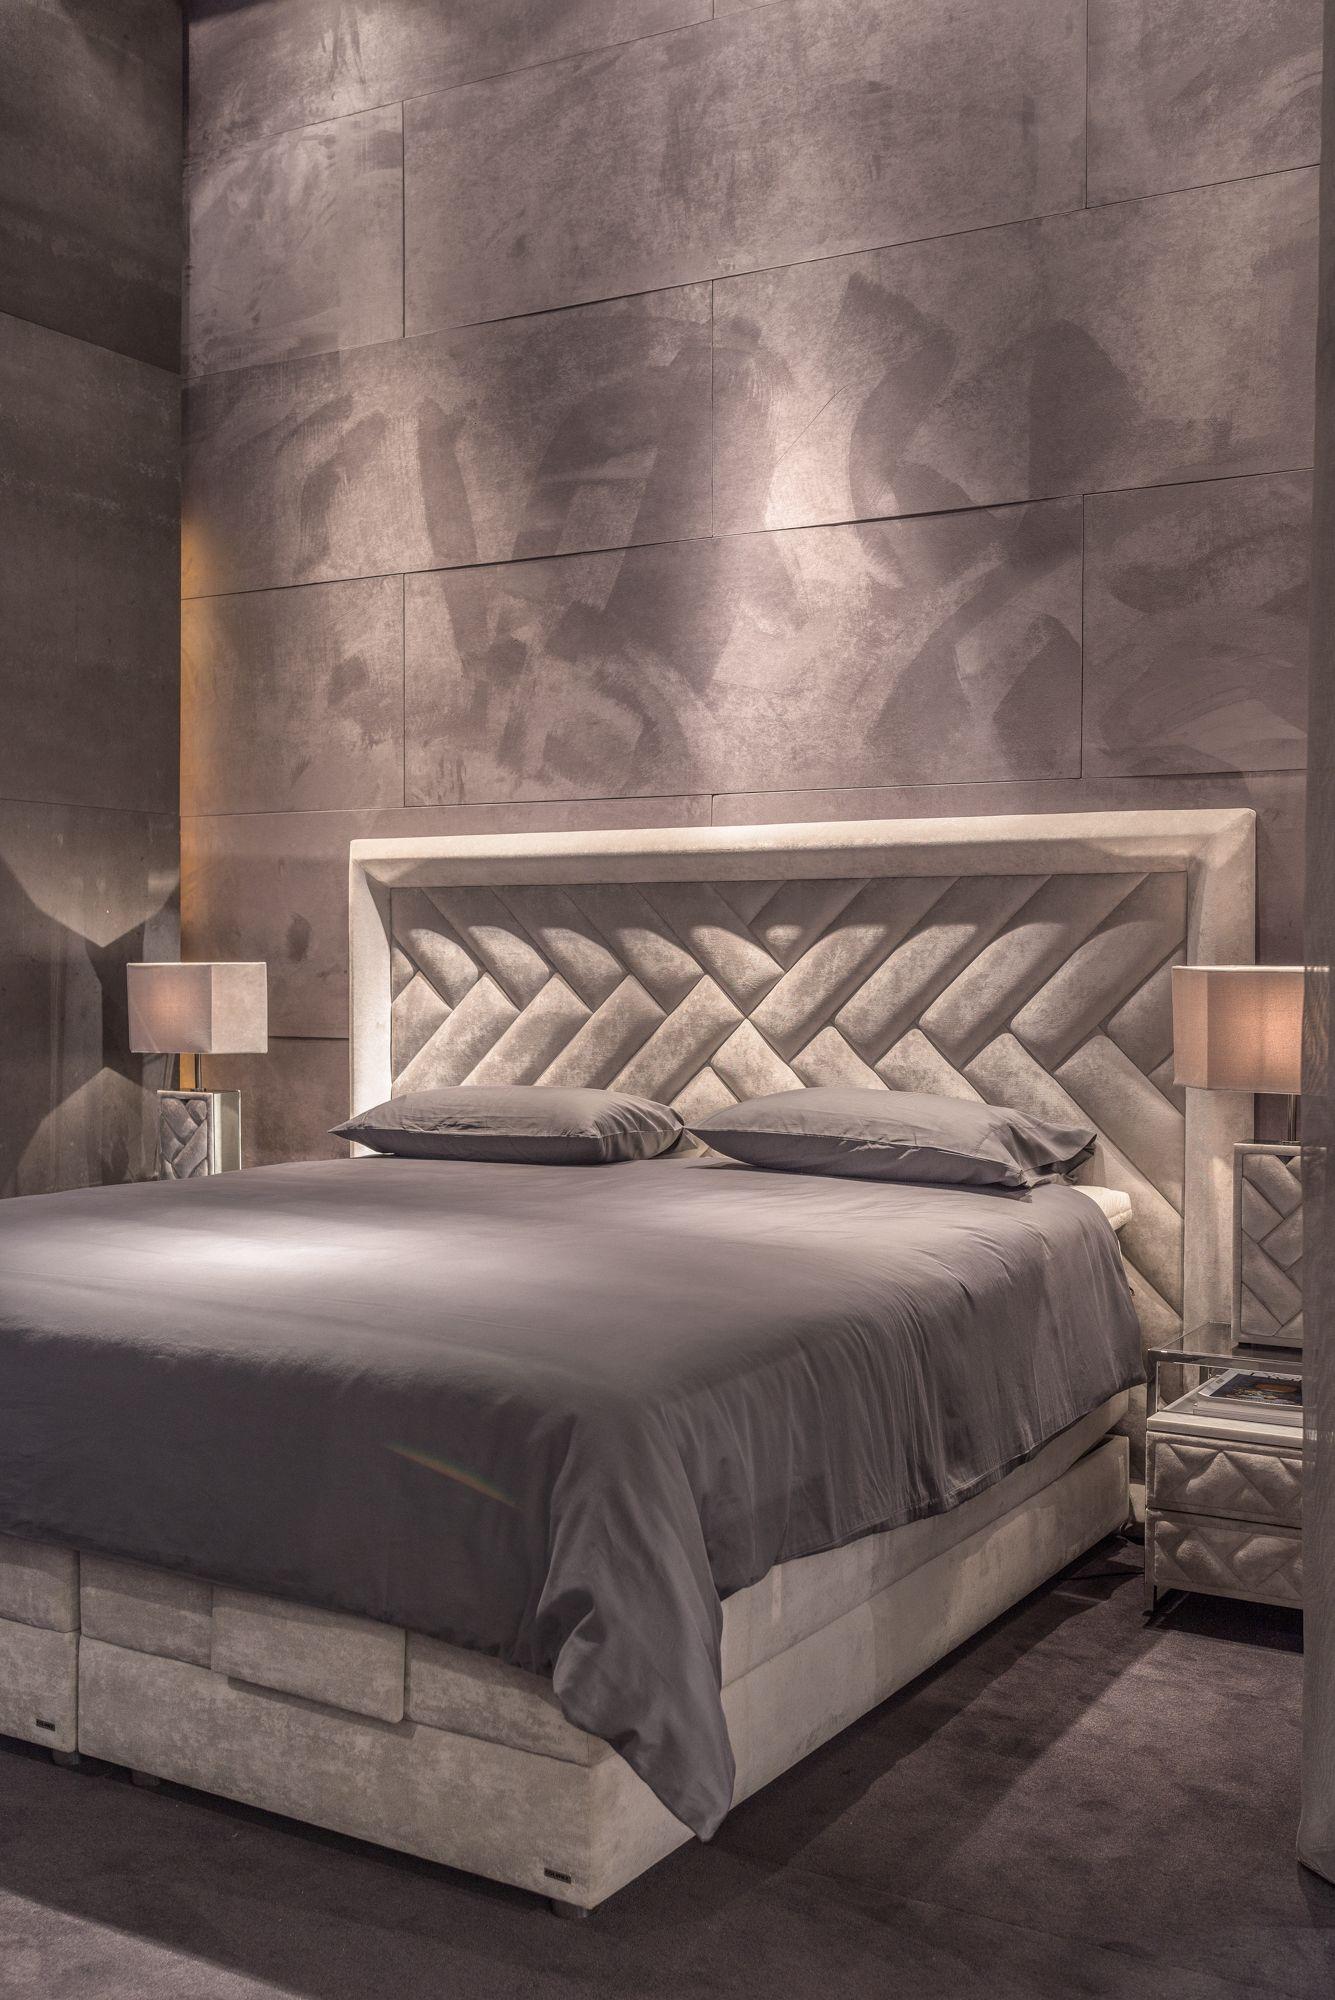 Carat Headboard Carat Lamp And Carat Side Table By Colunex Maison Et Objet Sept 2017 Bed Furniture Design Bed Headboard Design Bed Back Design